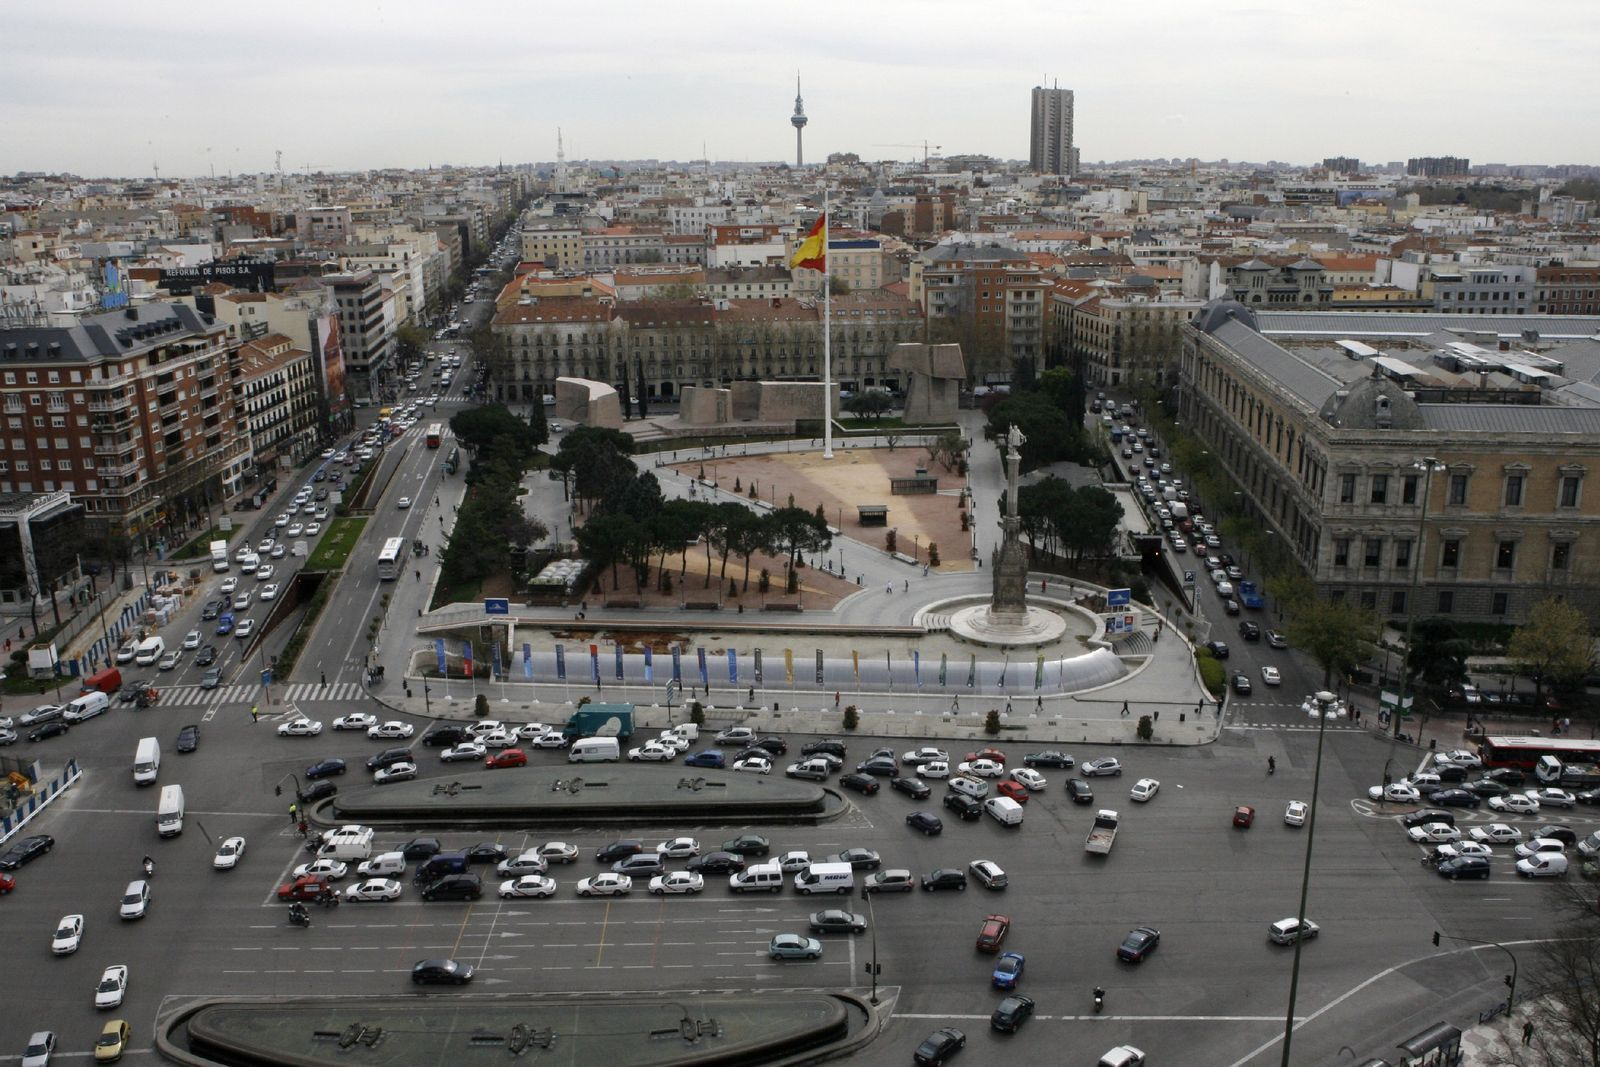 Madrid / Plaza Colon